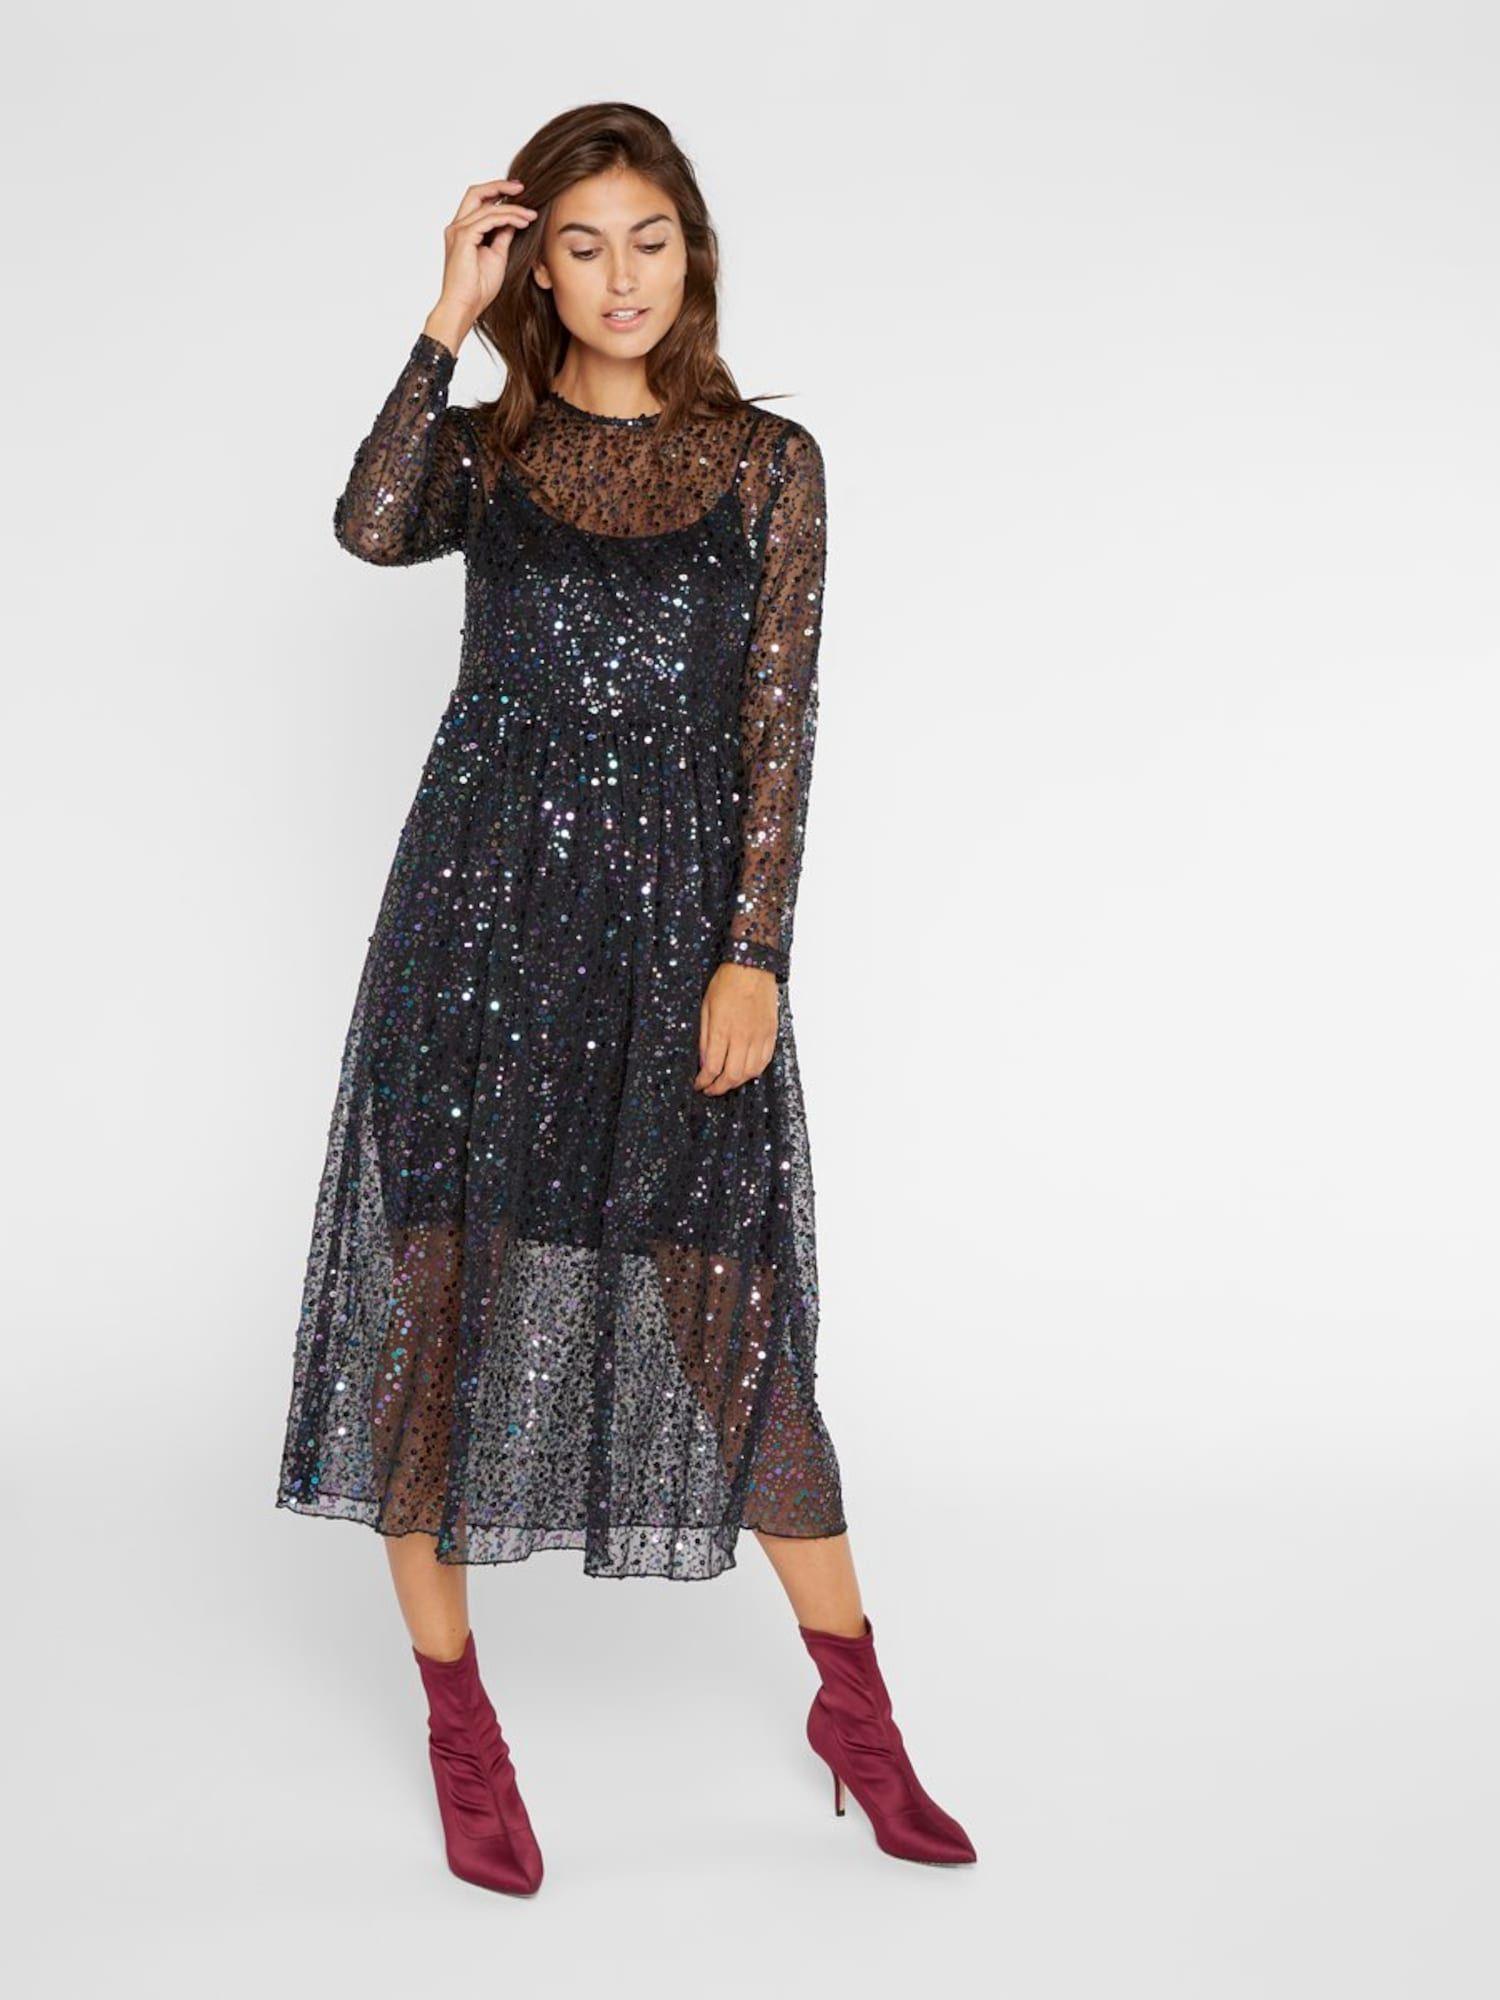 15 Kreativ Y.A.S Abendkleid SpezialgebietAbend Schön Y.A.S Abendkleid Stylish